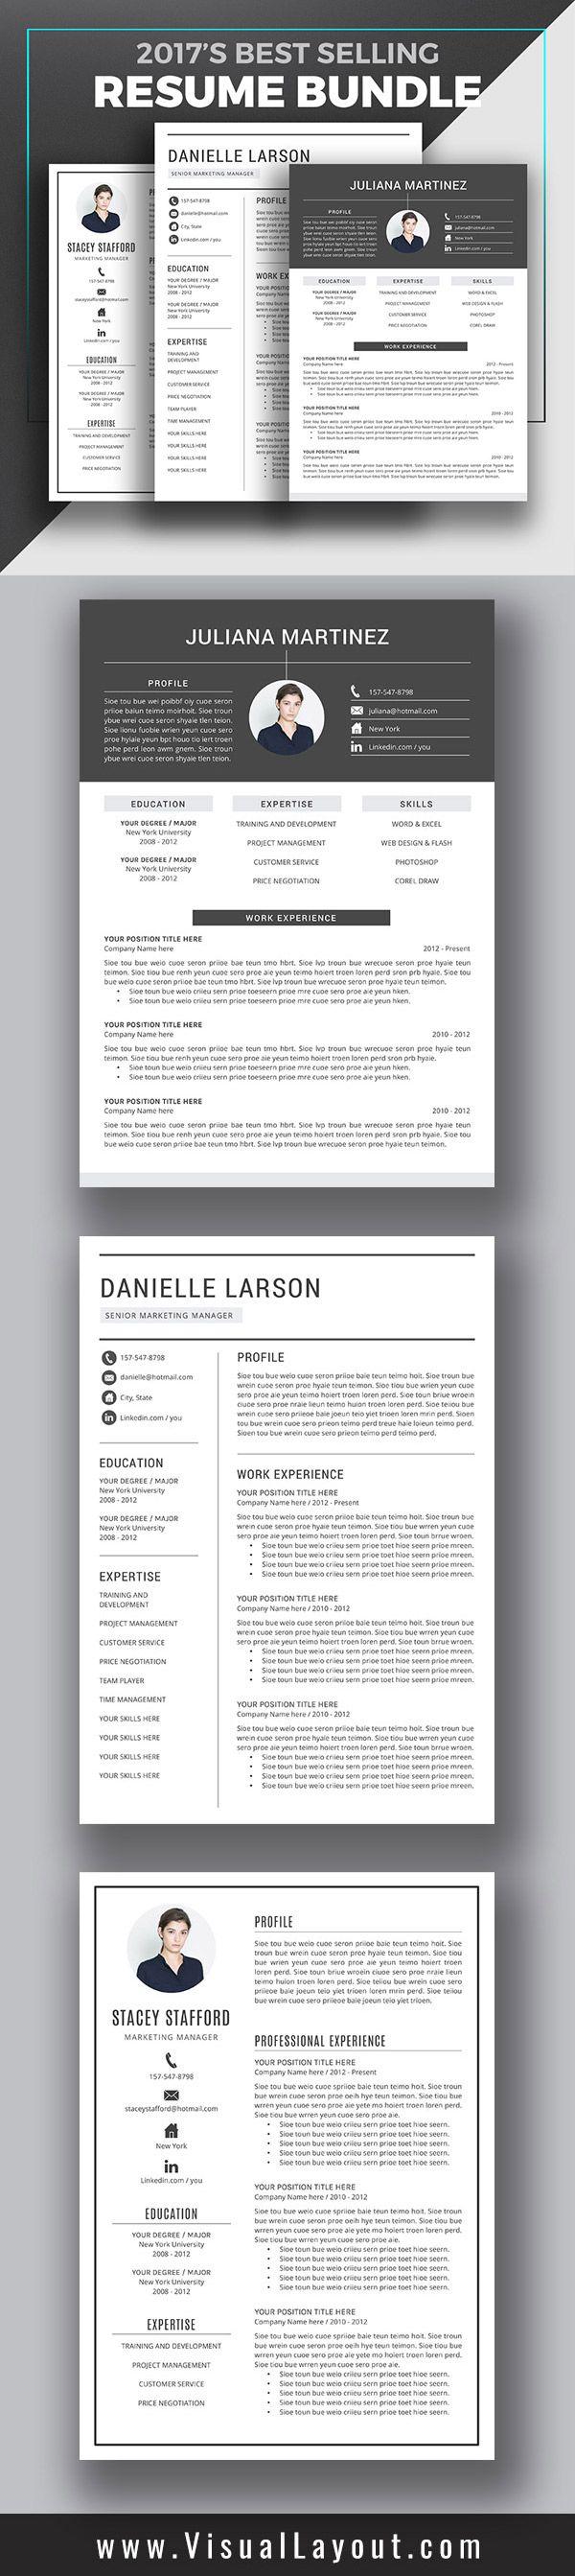 2017u0027s Best Selling Resume Bundle Professional u0026